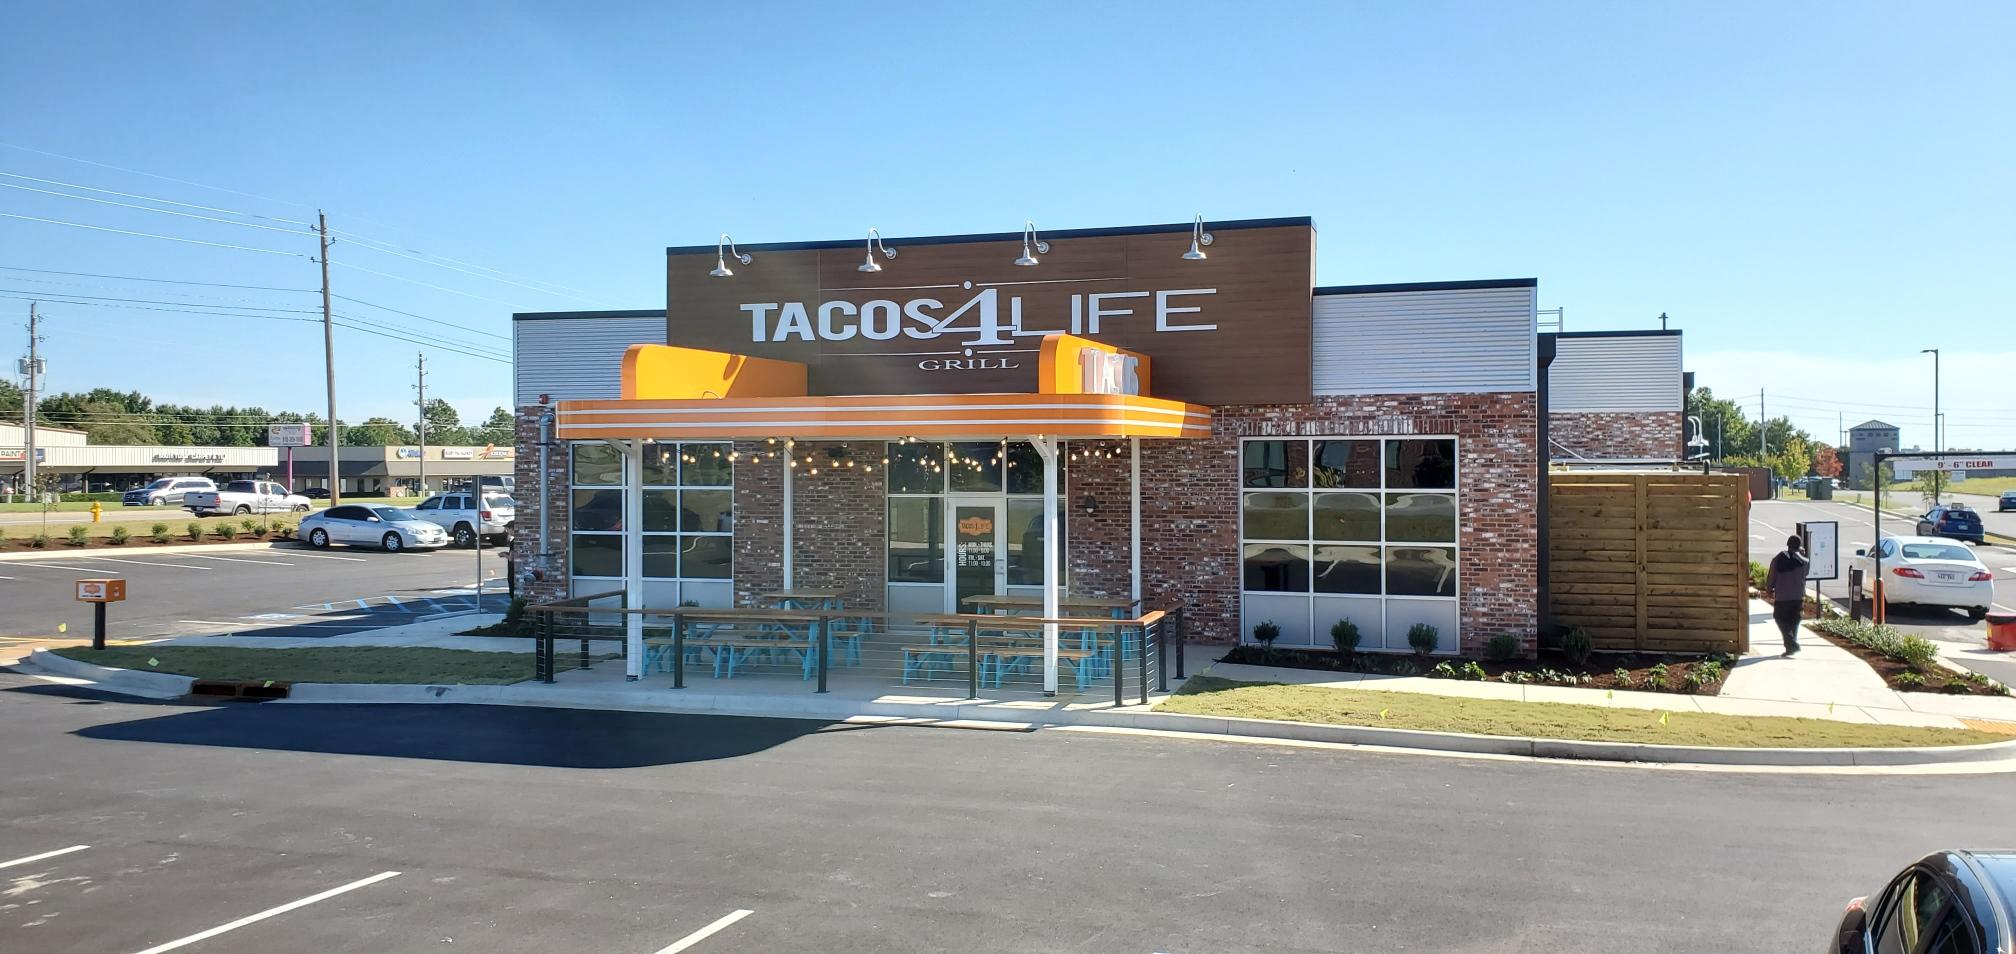 Tacos 4 Life in Tulsa, OK